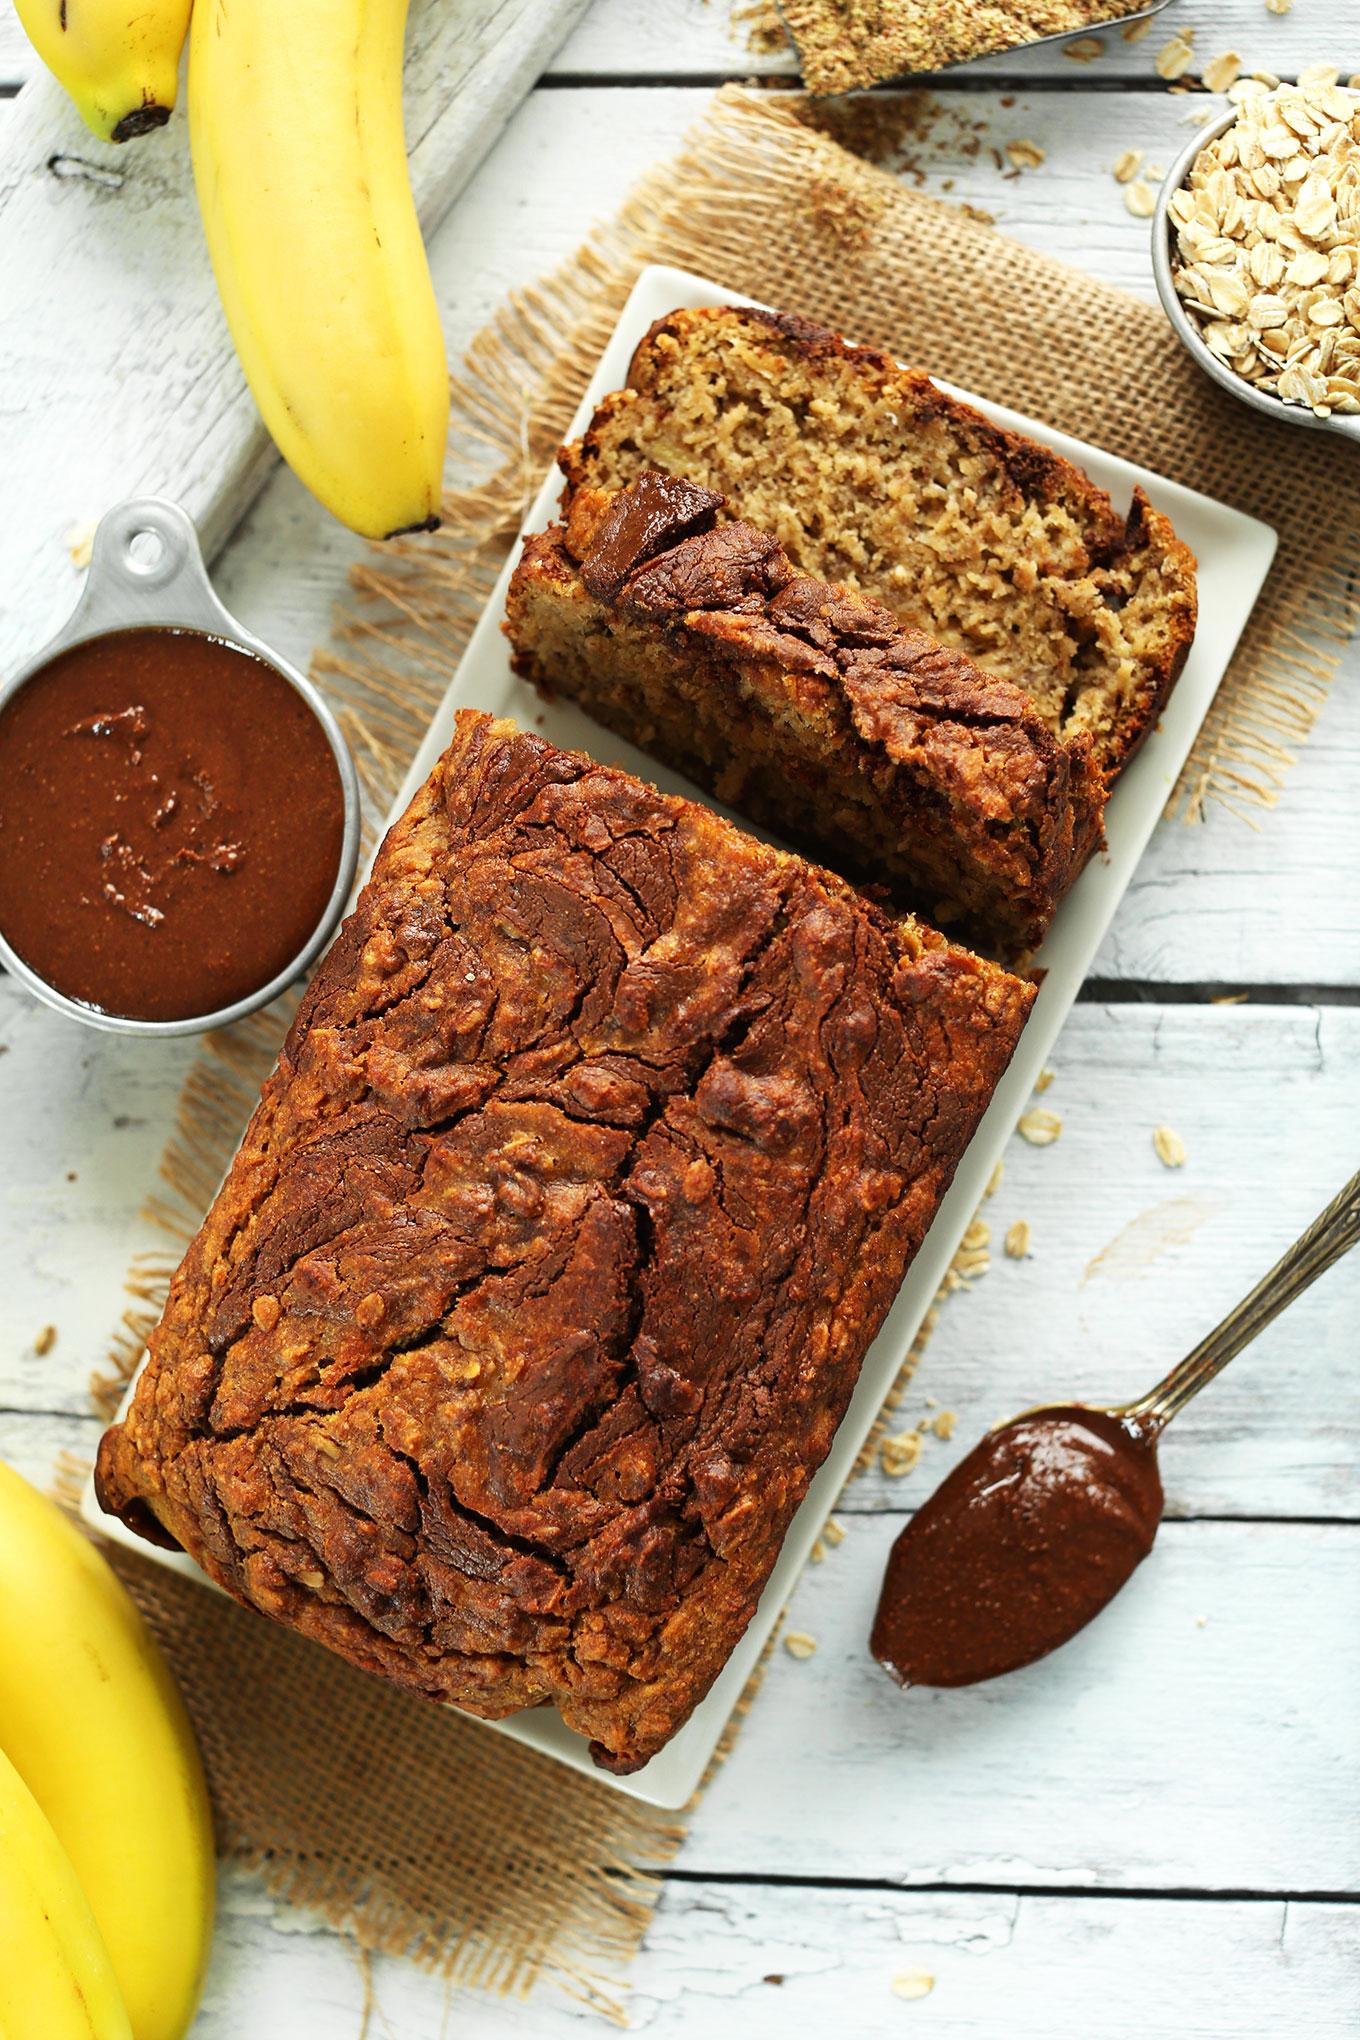 Simple Banana Nut Bread Recipe